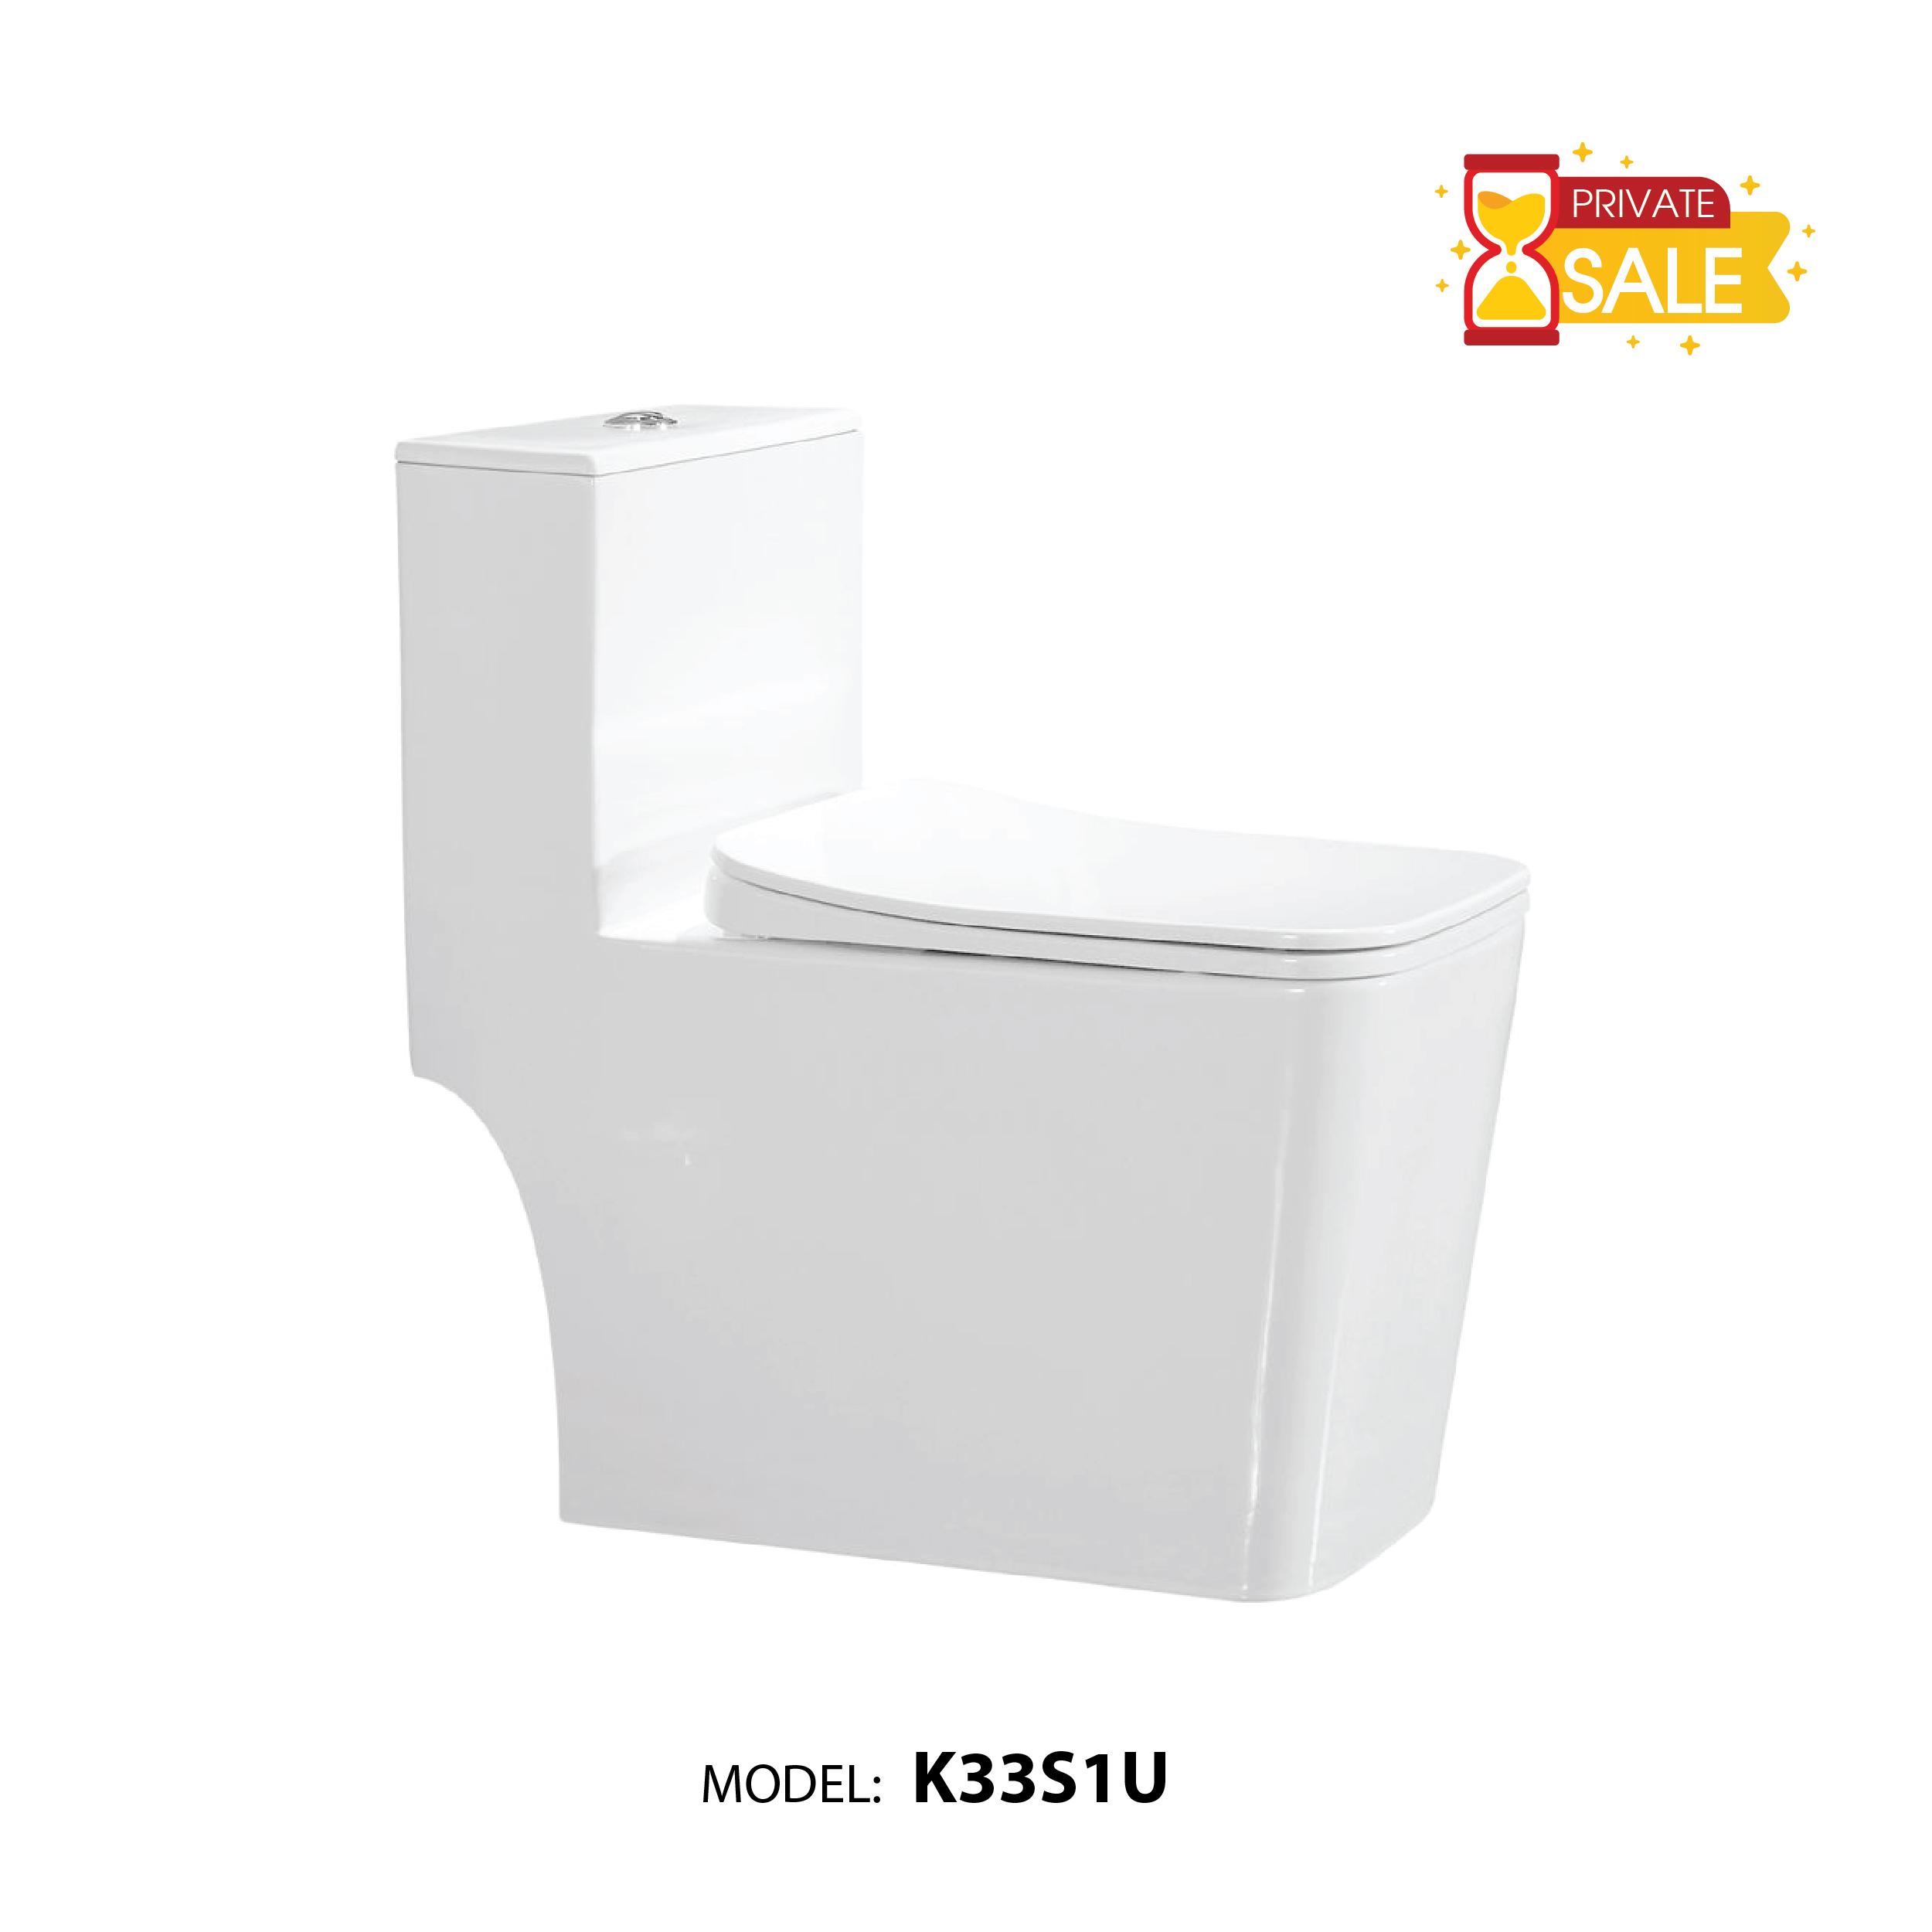 BỒN CẦU CARANO 1 KHỐI K33S1U (TOILET MODEL: K33S1U)